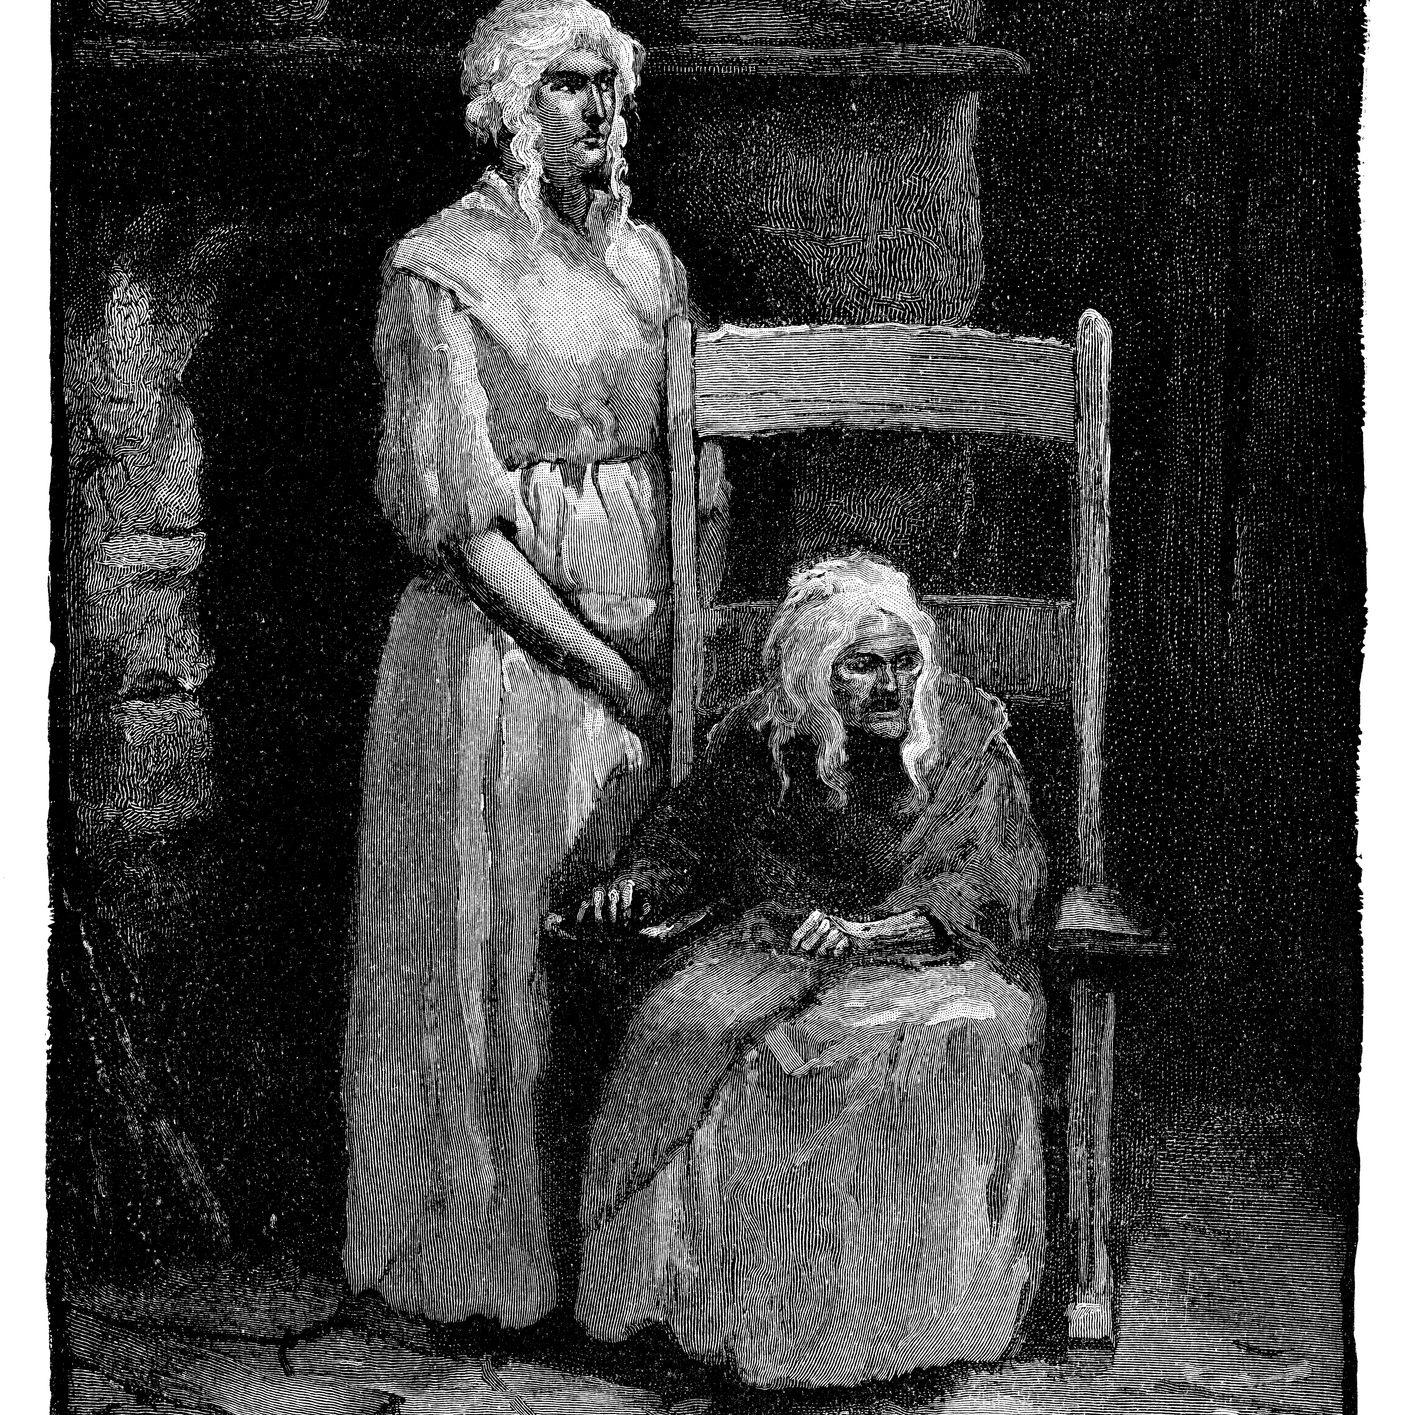 Marie Laveau voodoo priestess